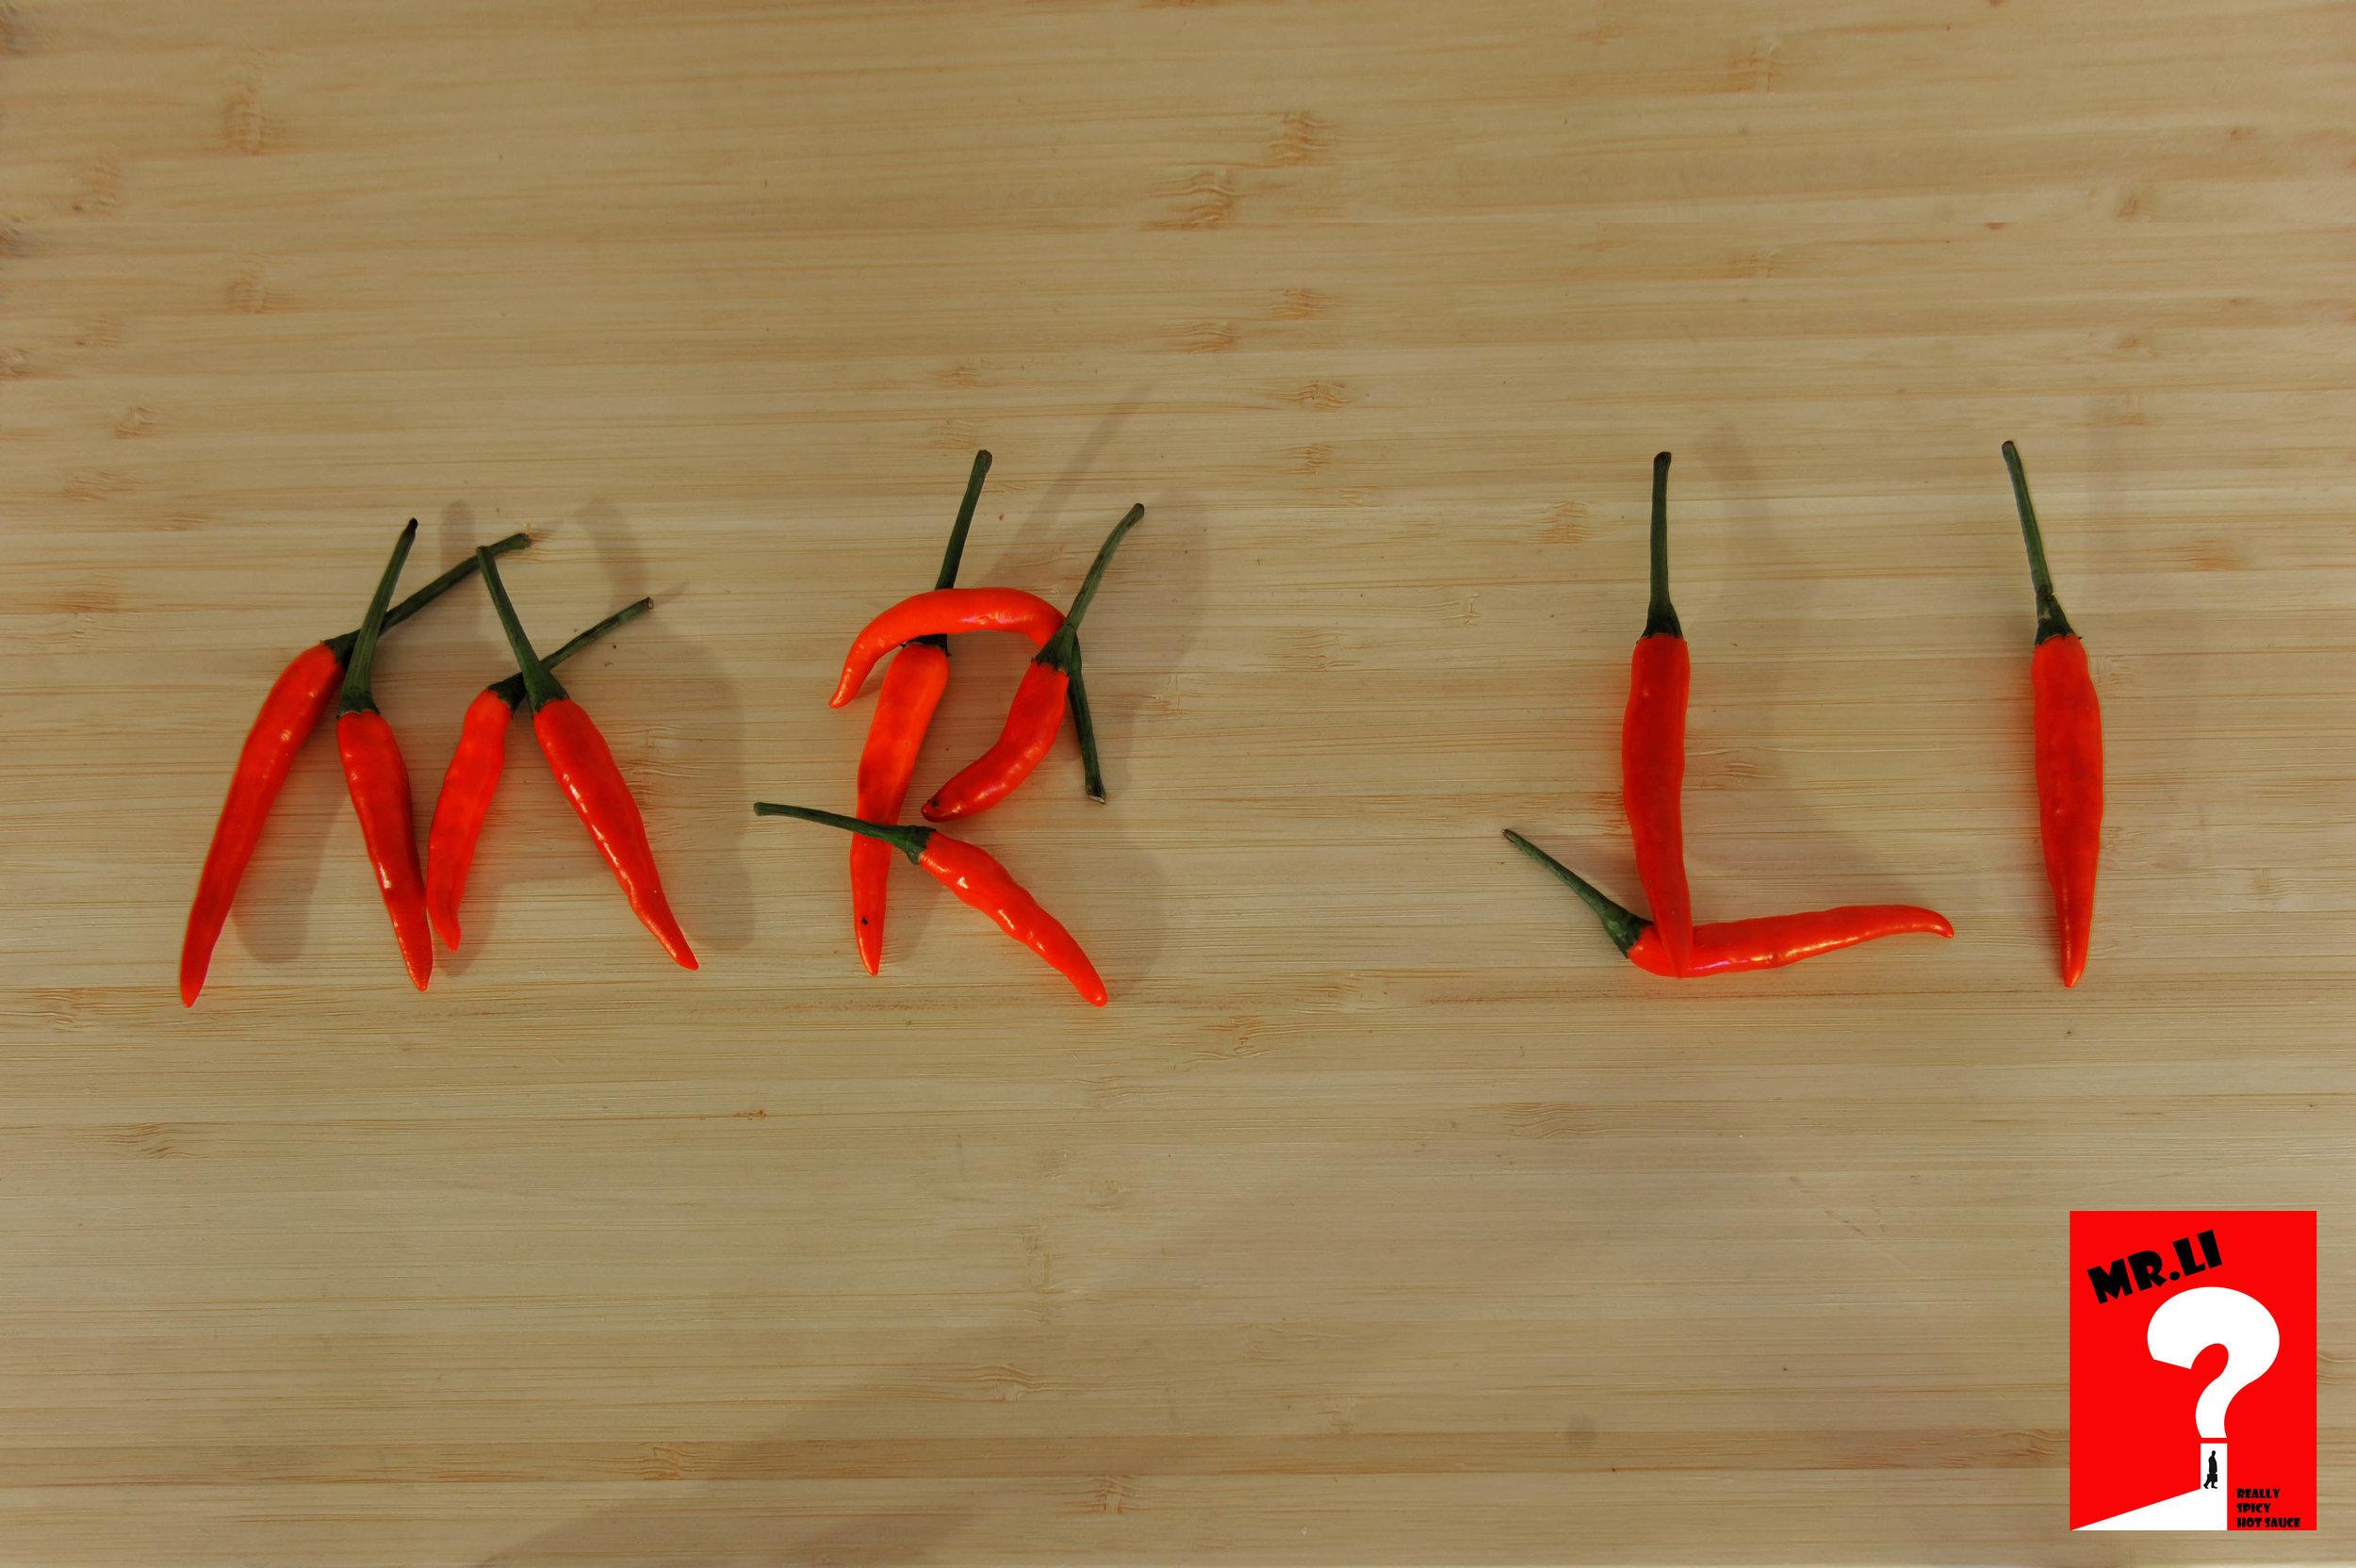 Li_hot peppers_small.jpg